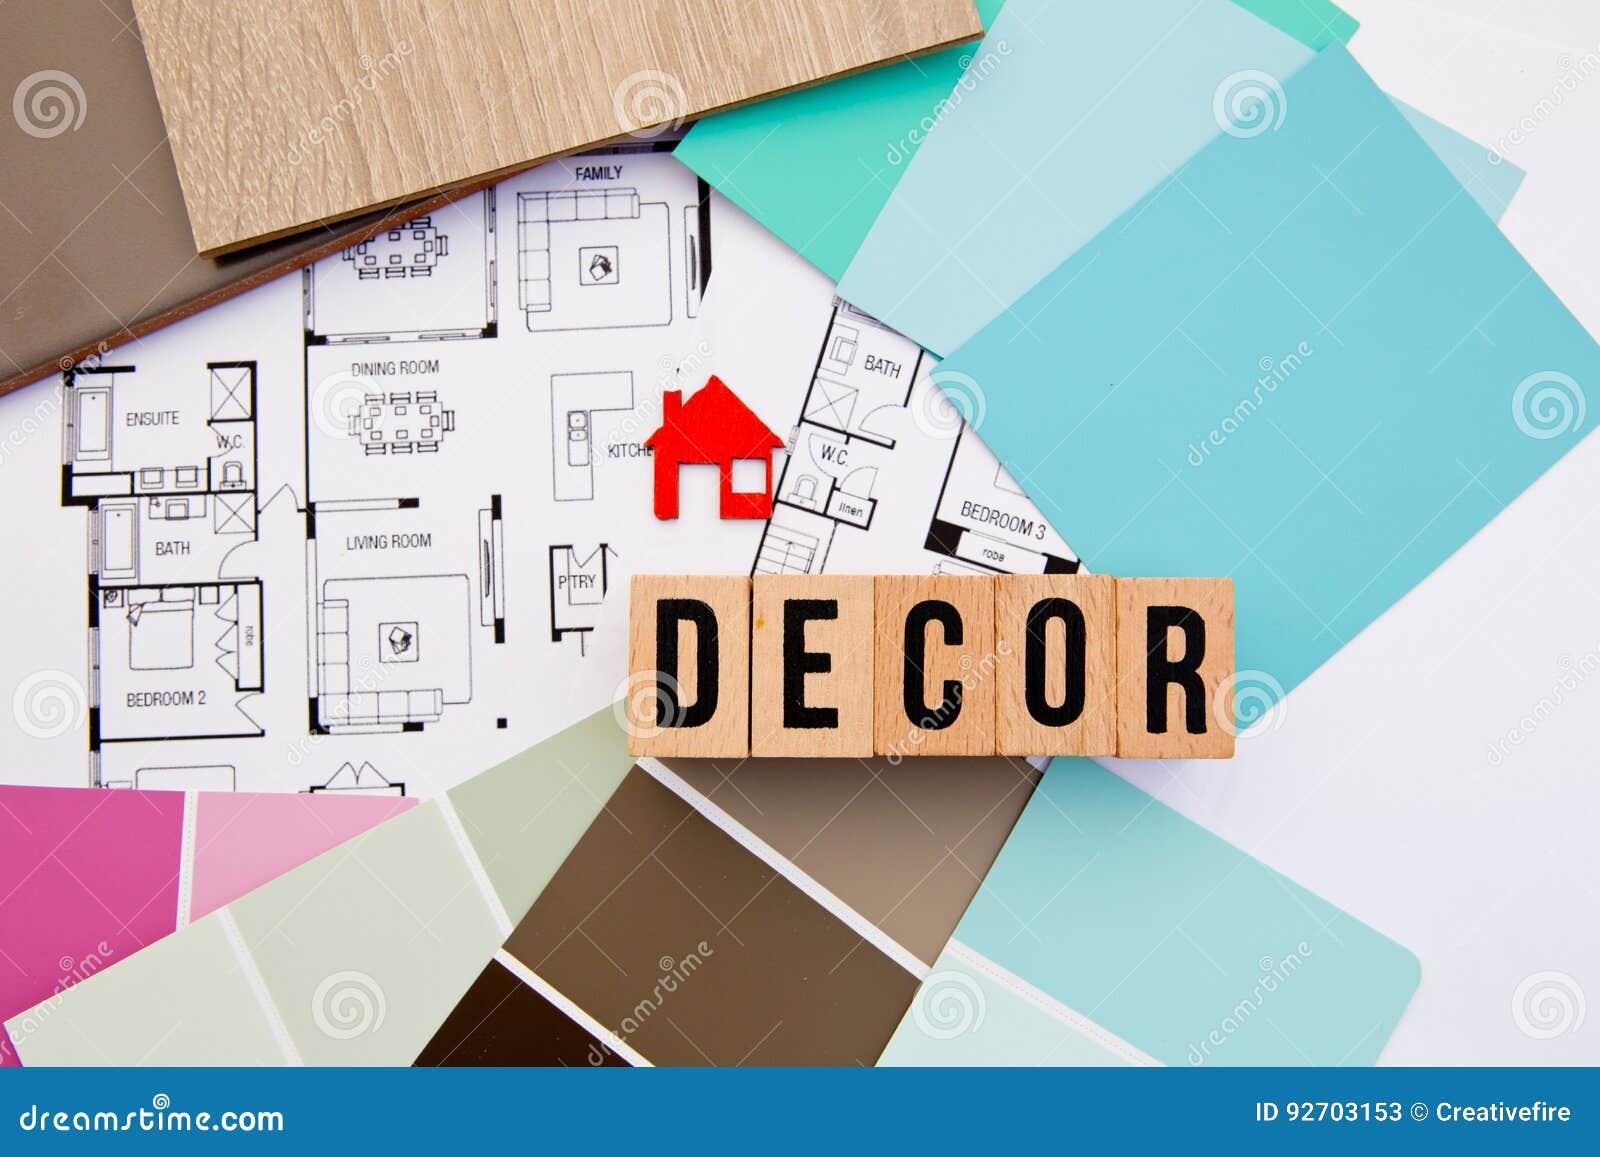 Home Décor - Interior Design